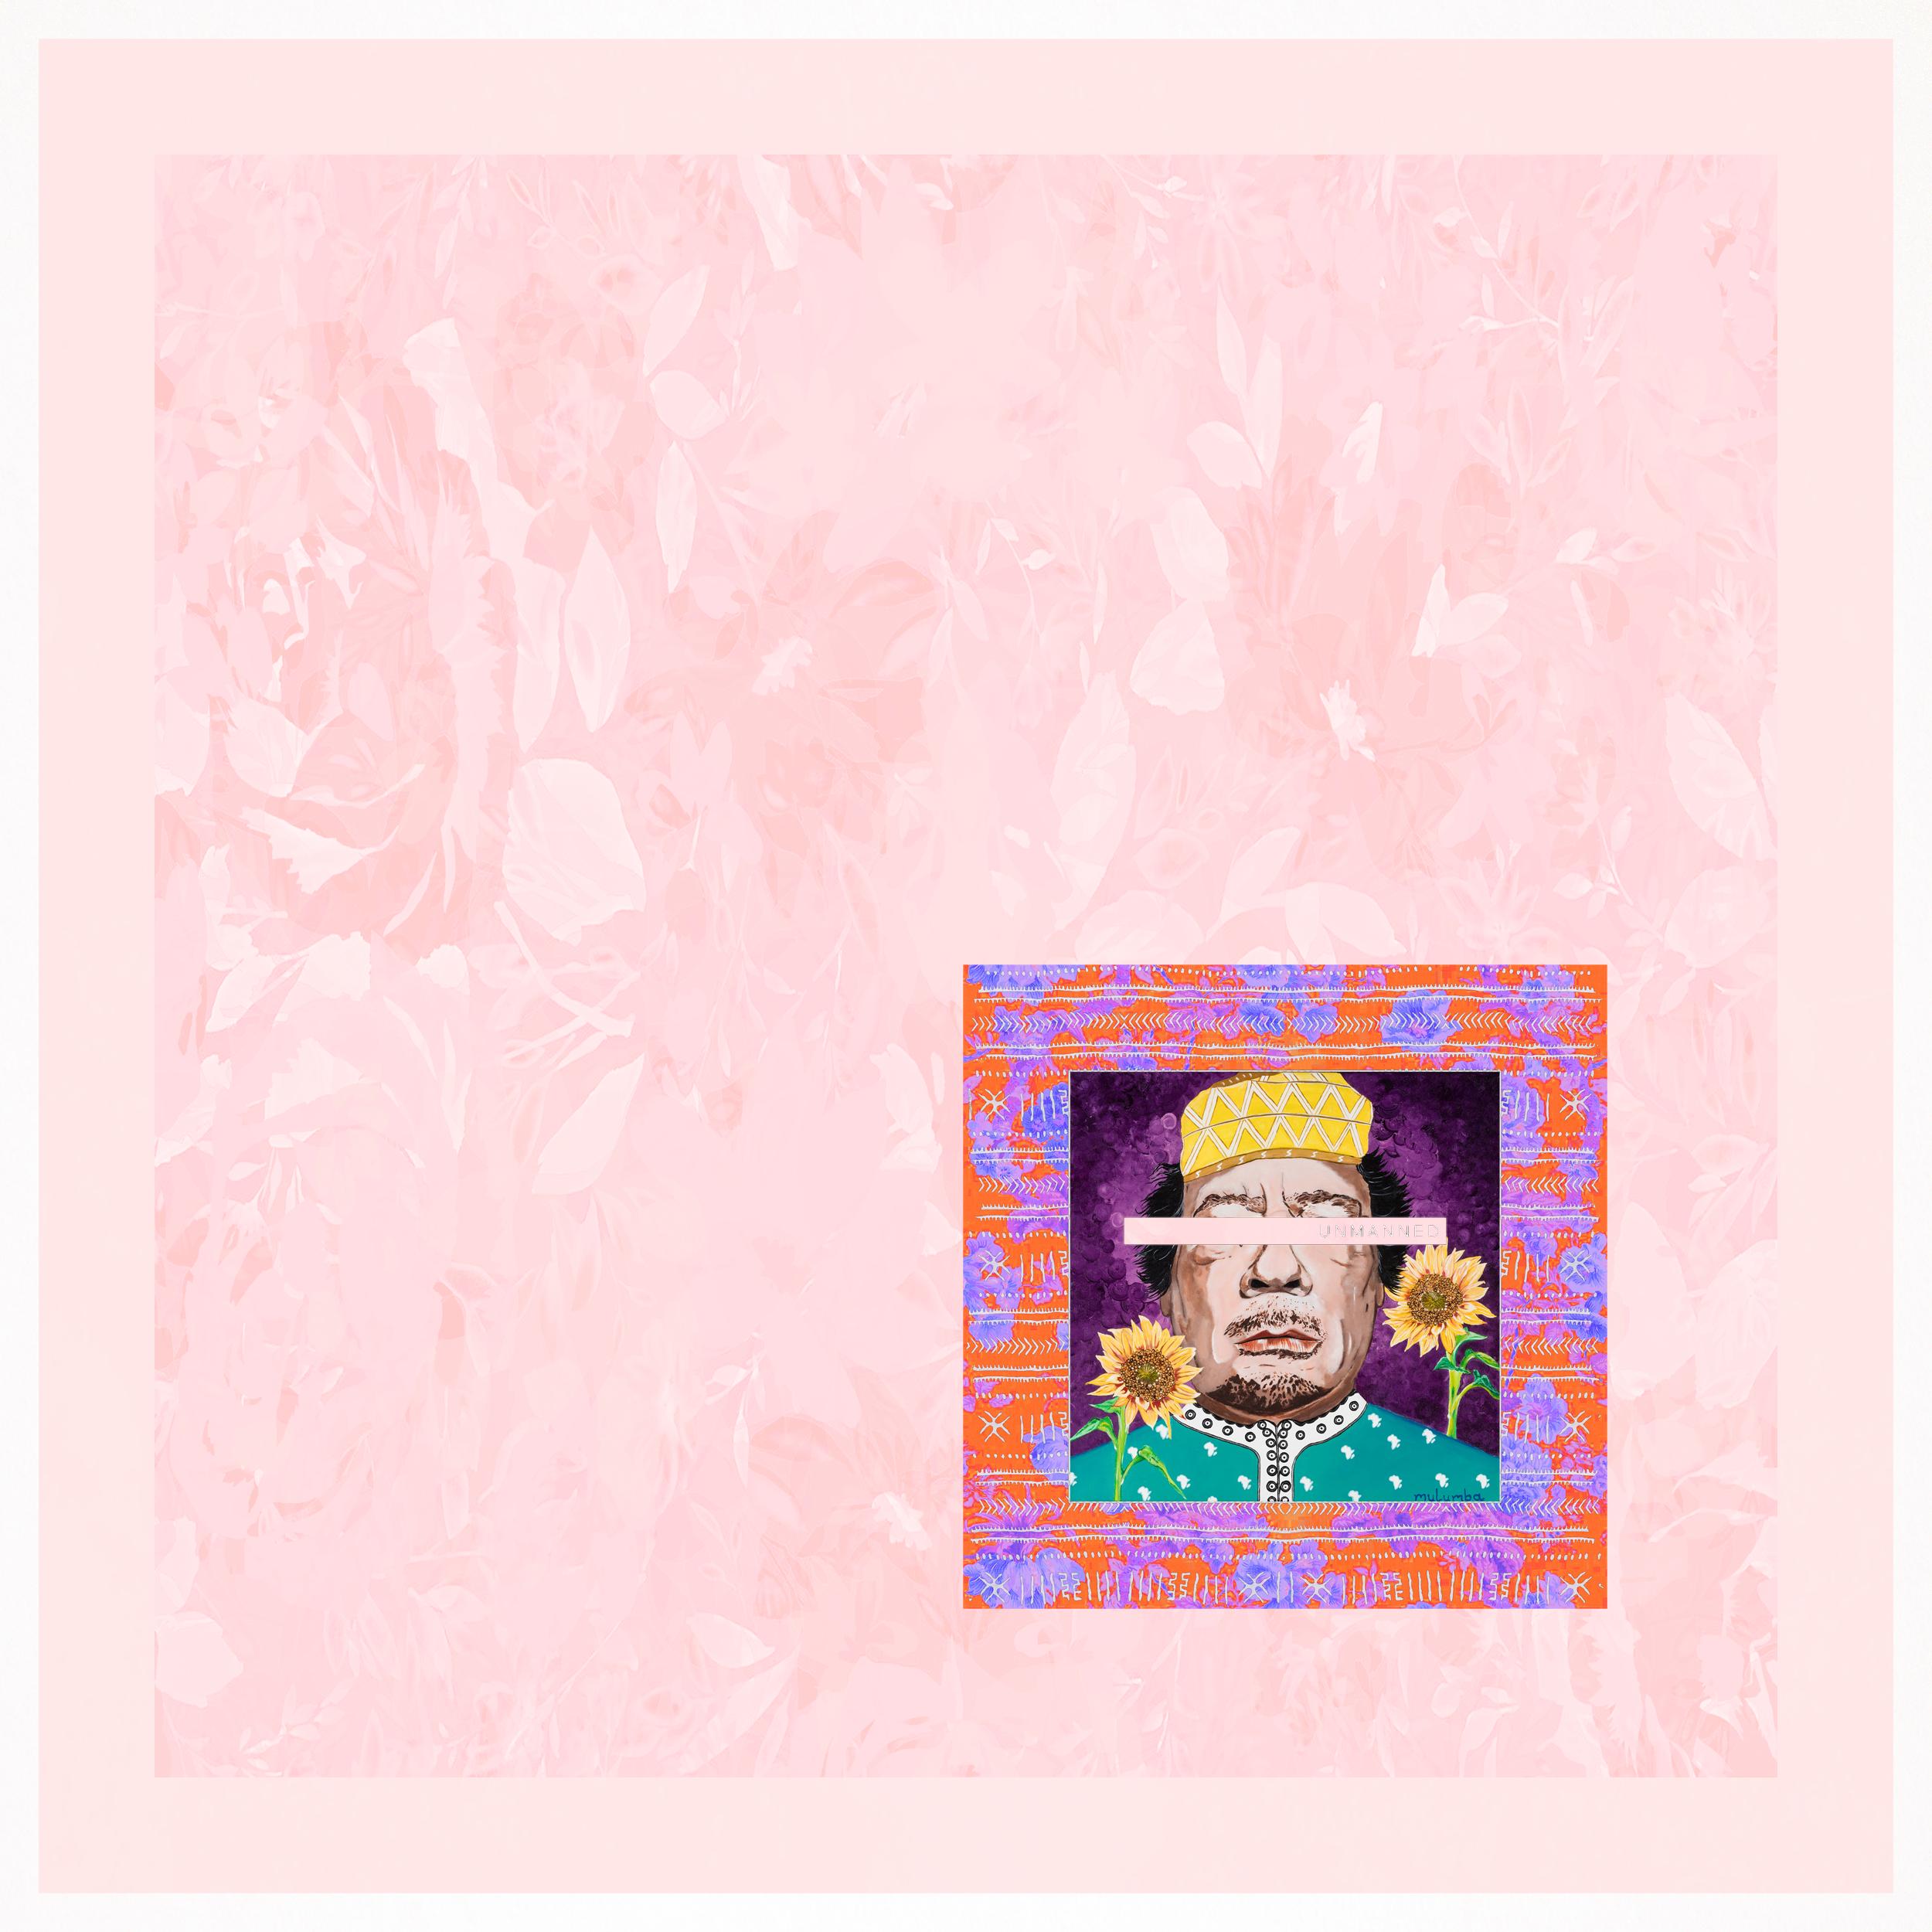 MULUMBA The Dictator's Garden Pink Dict Mo Gaddafi LT JOE NEGRO FB PROFILE.png